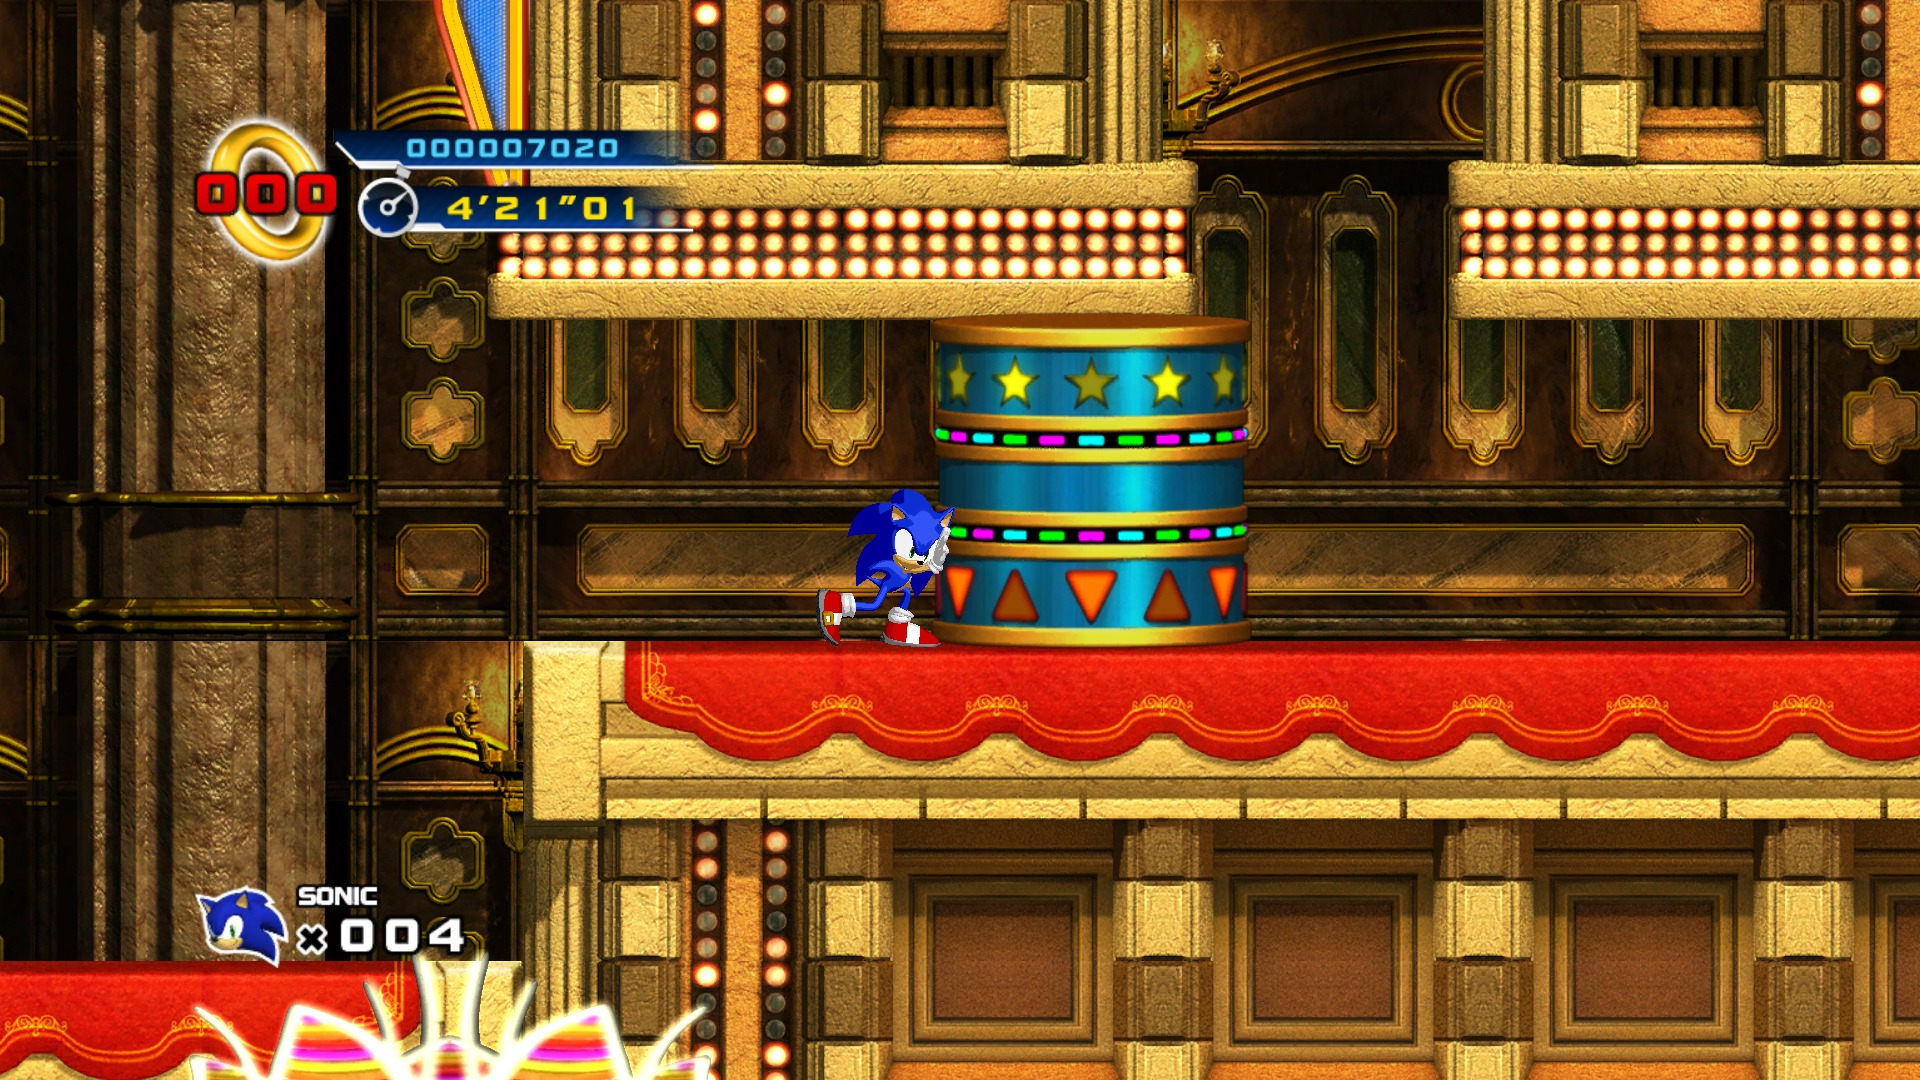 Sonic The Hedgehog 4 Episode 1 - Image 4